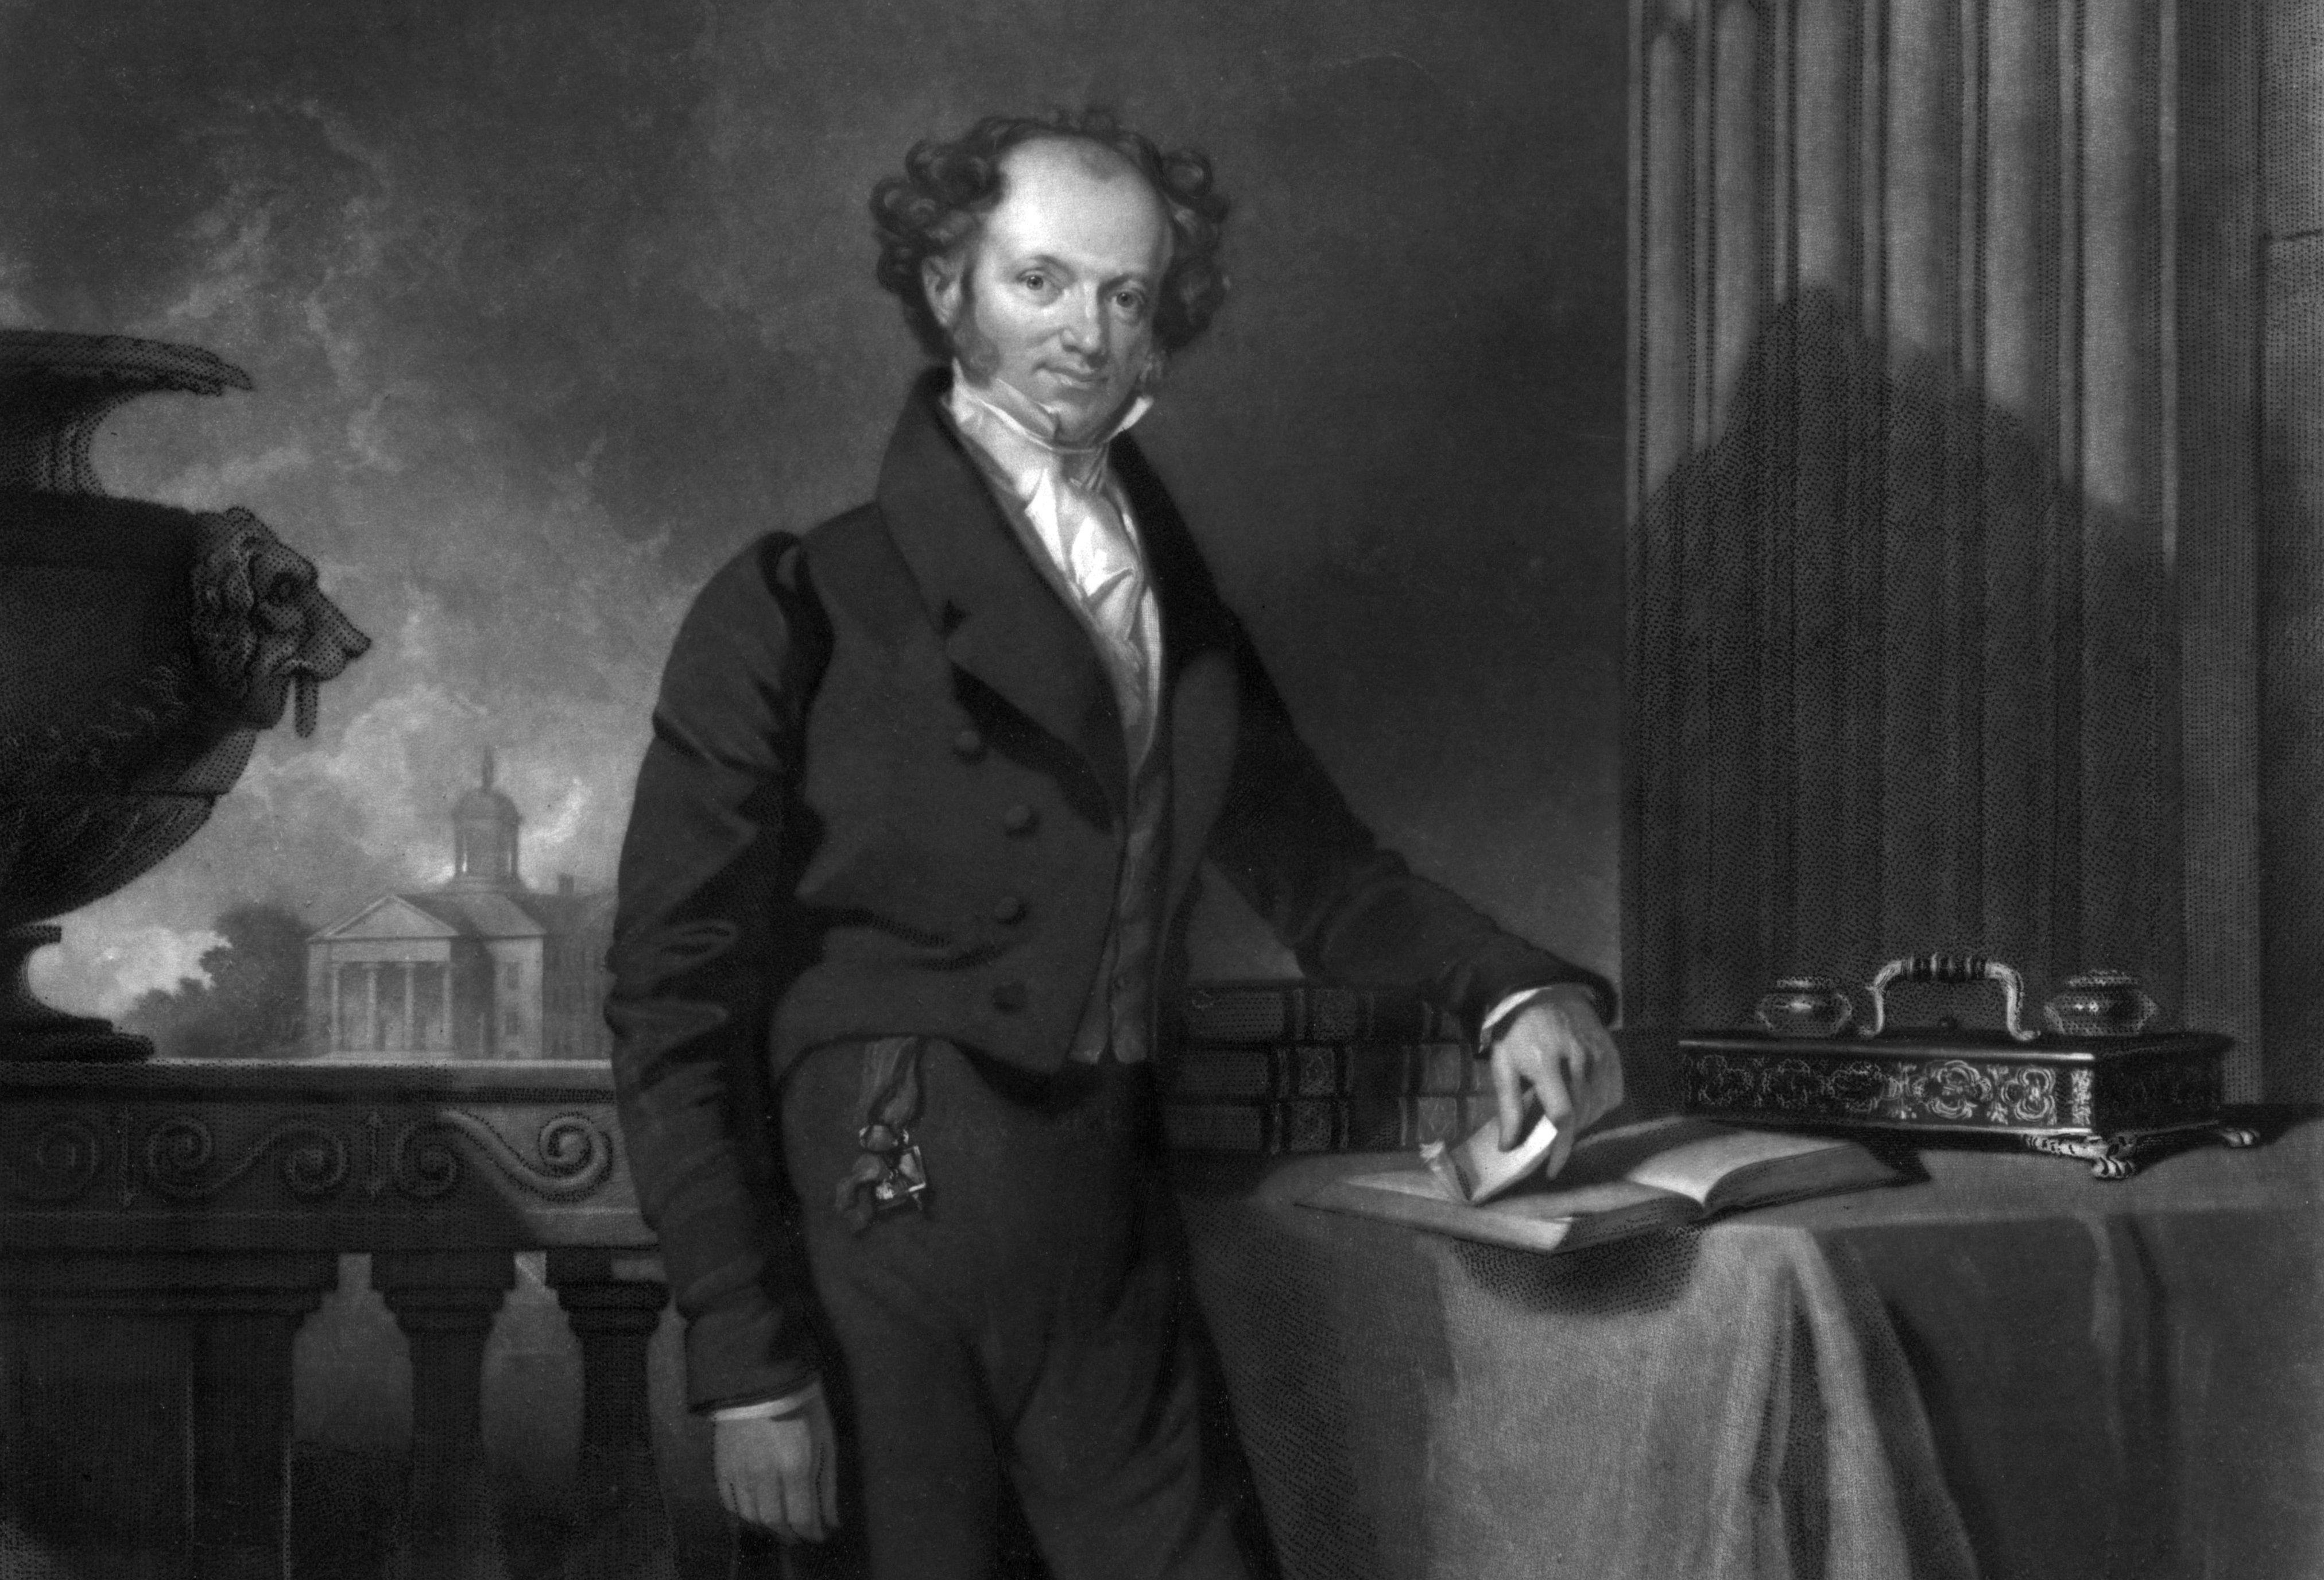 Engraving of Martin Van Buren as a young man standing on a balcony.